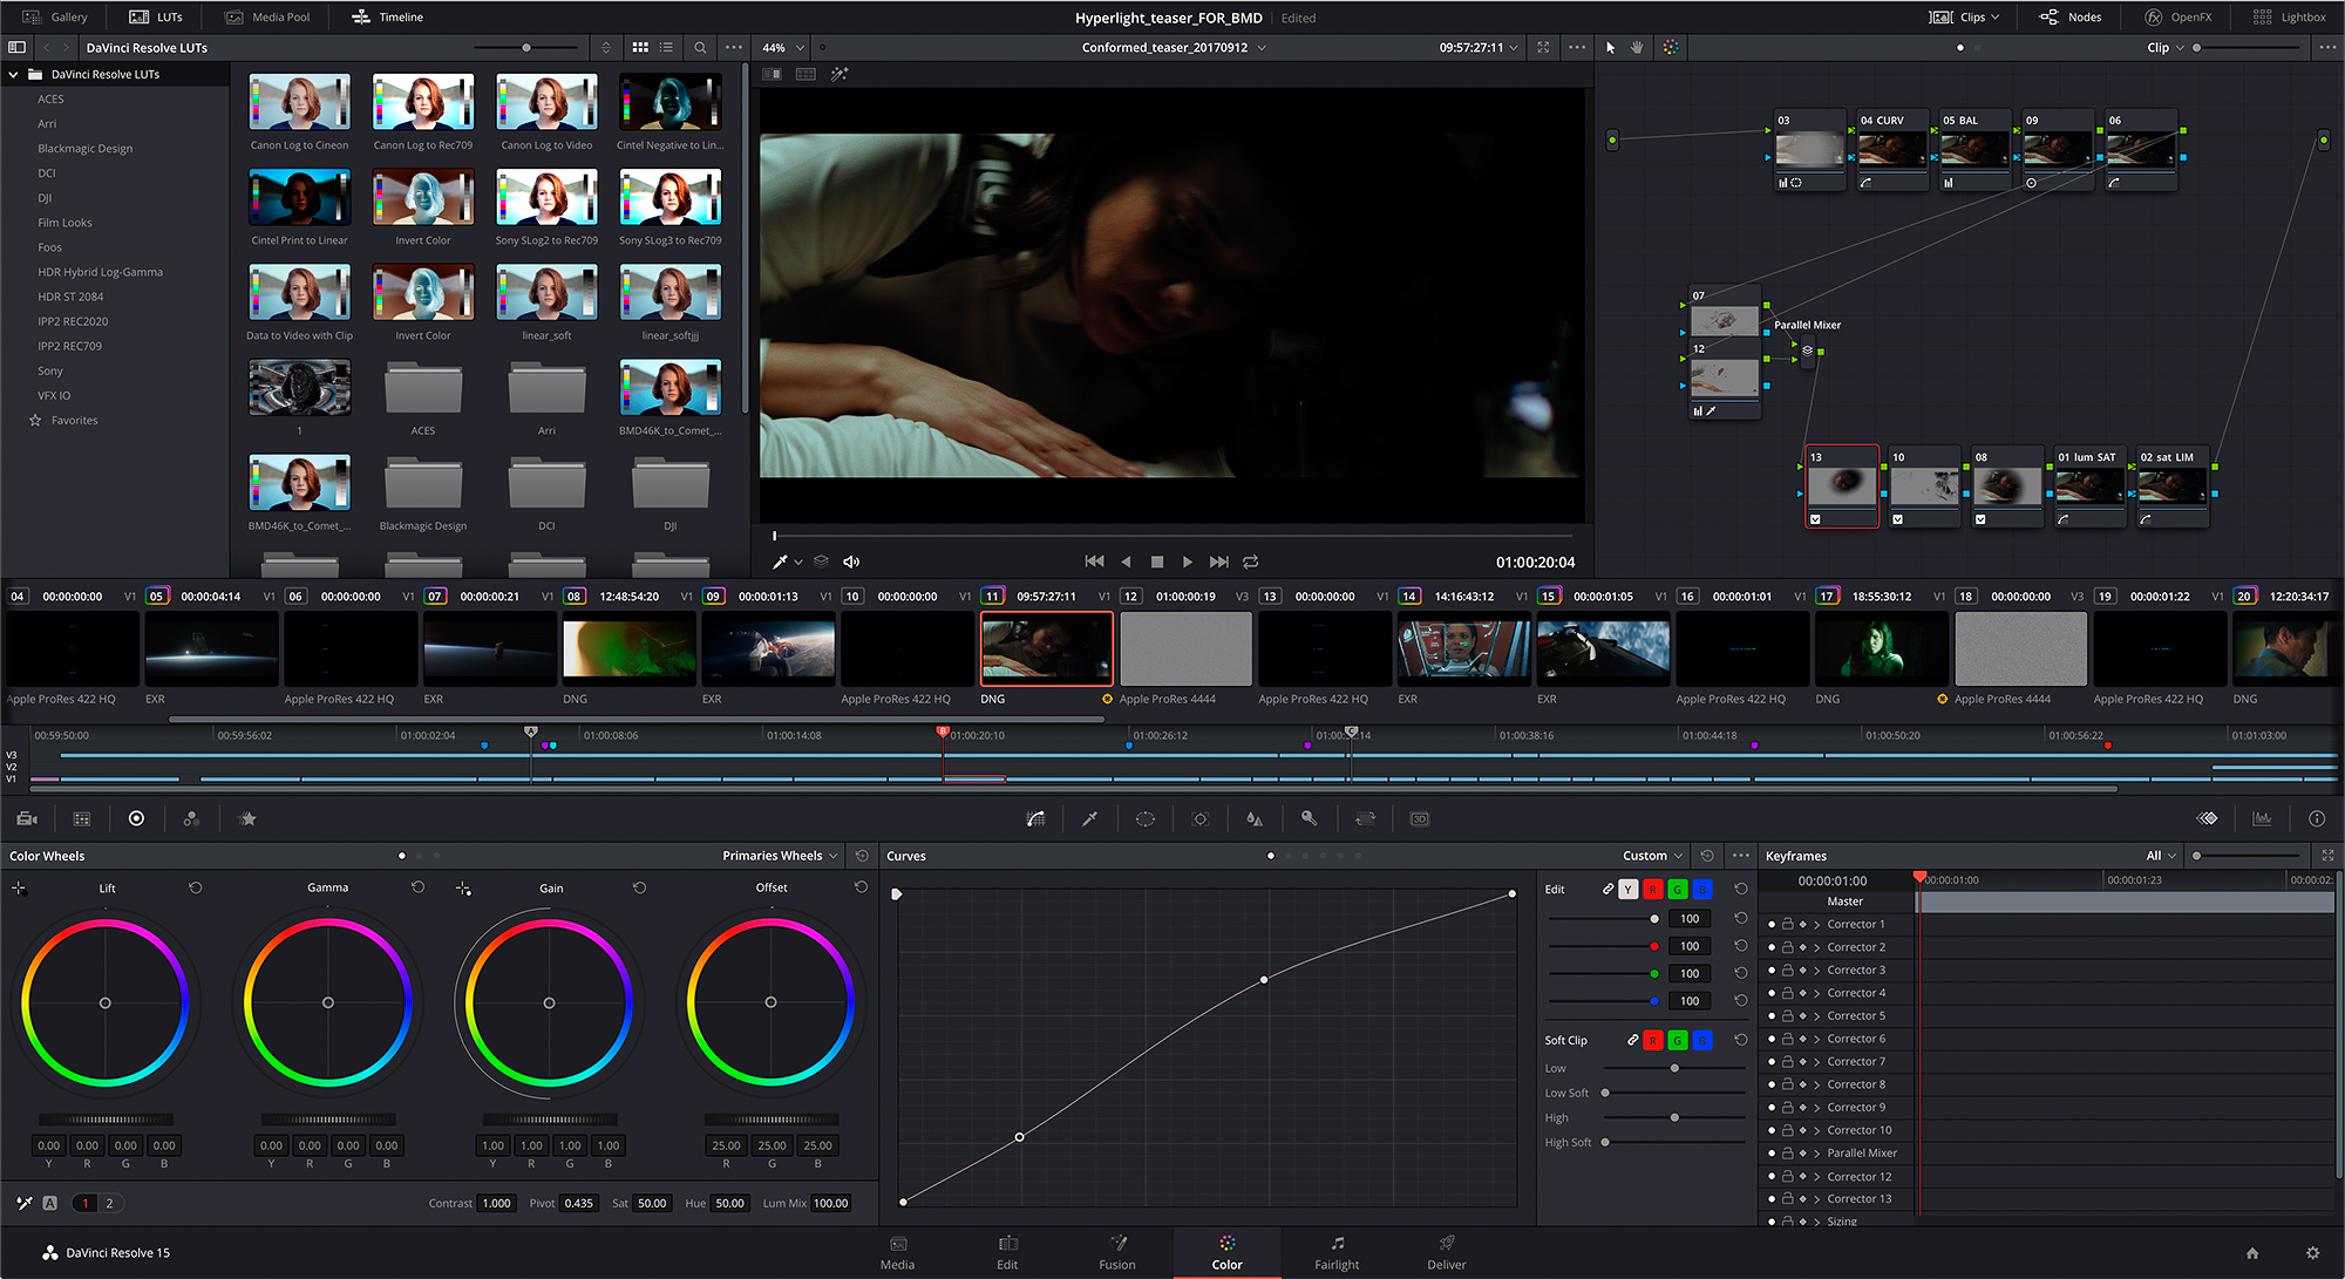 Nab 2018 Blackmagic Design Releases Davinci Resolve 15 Video